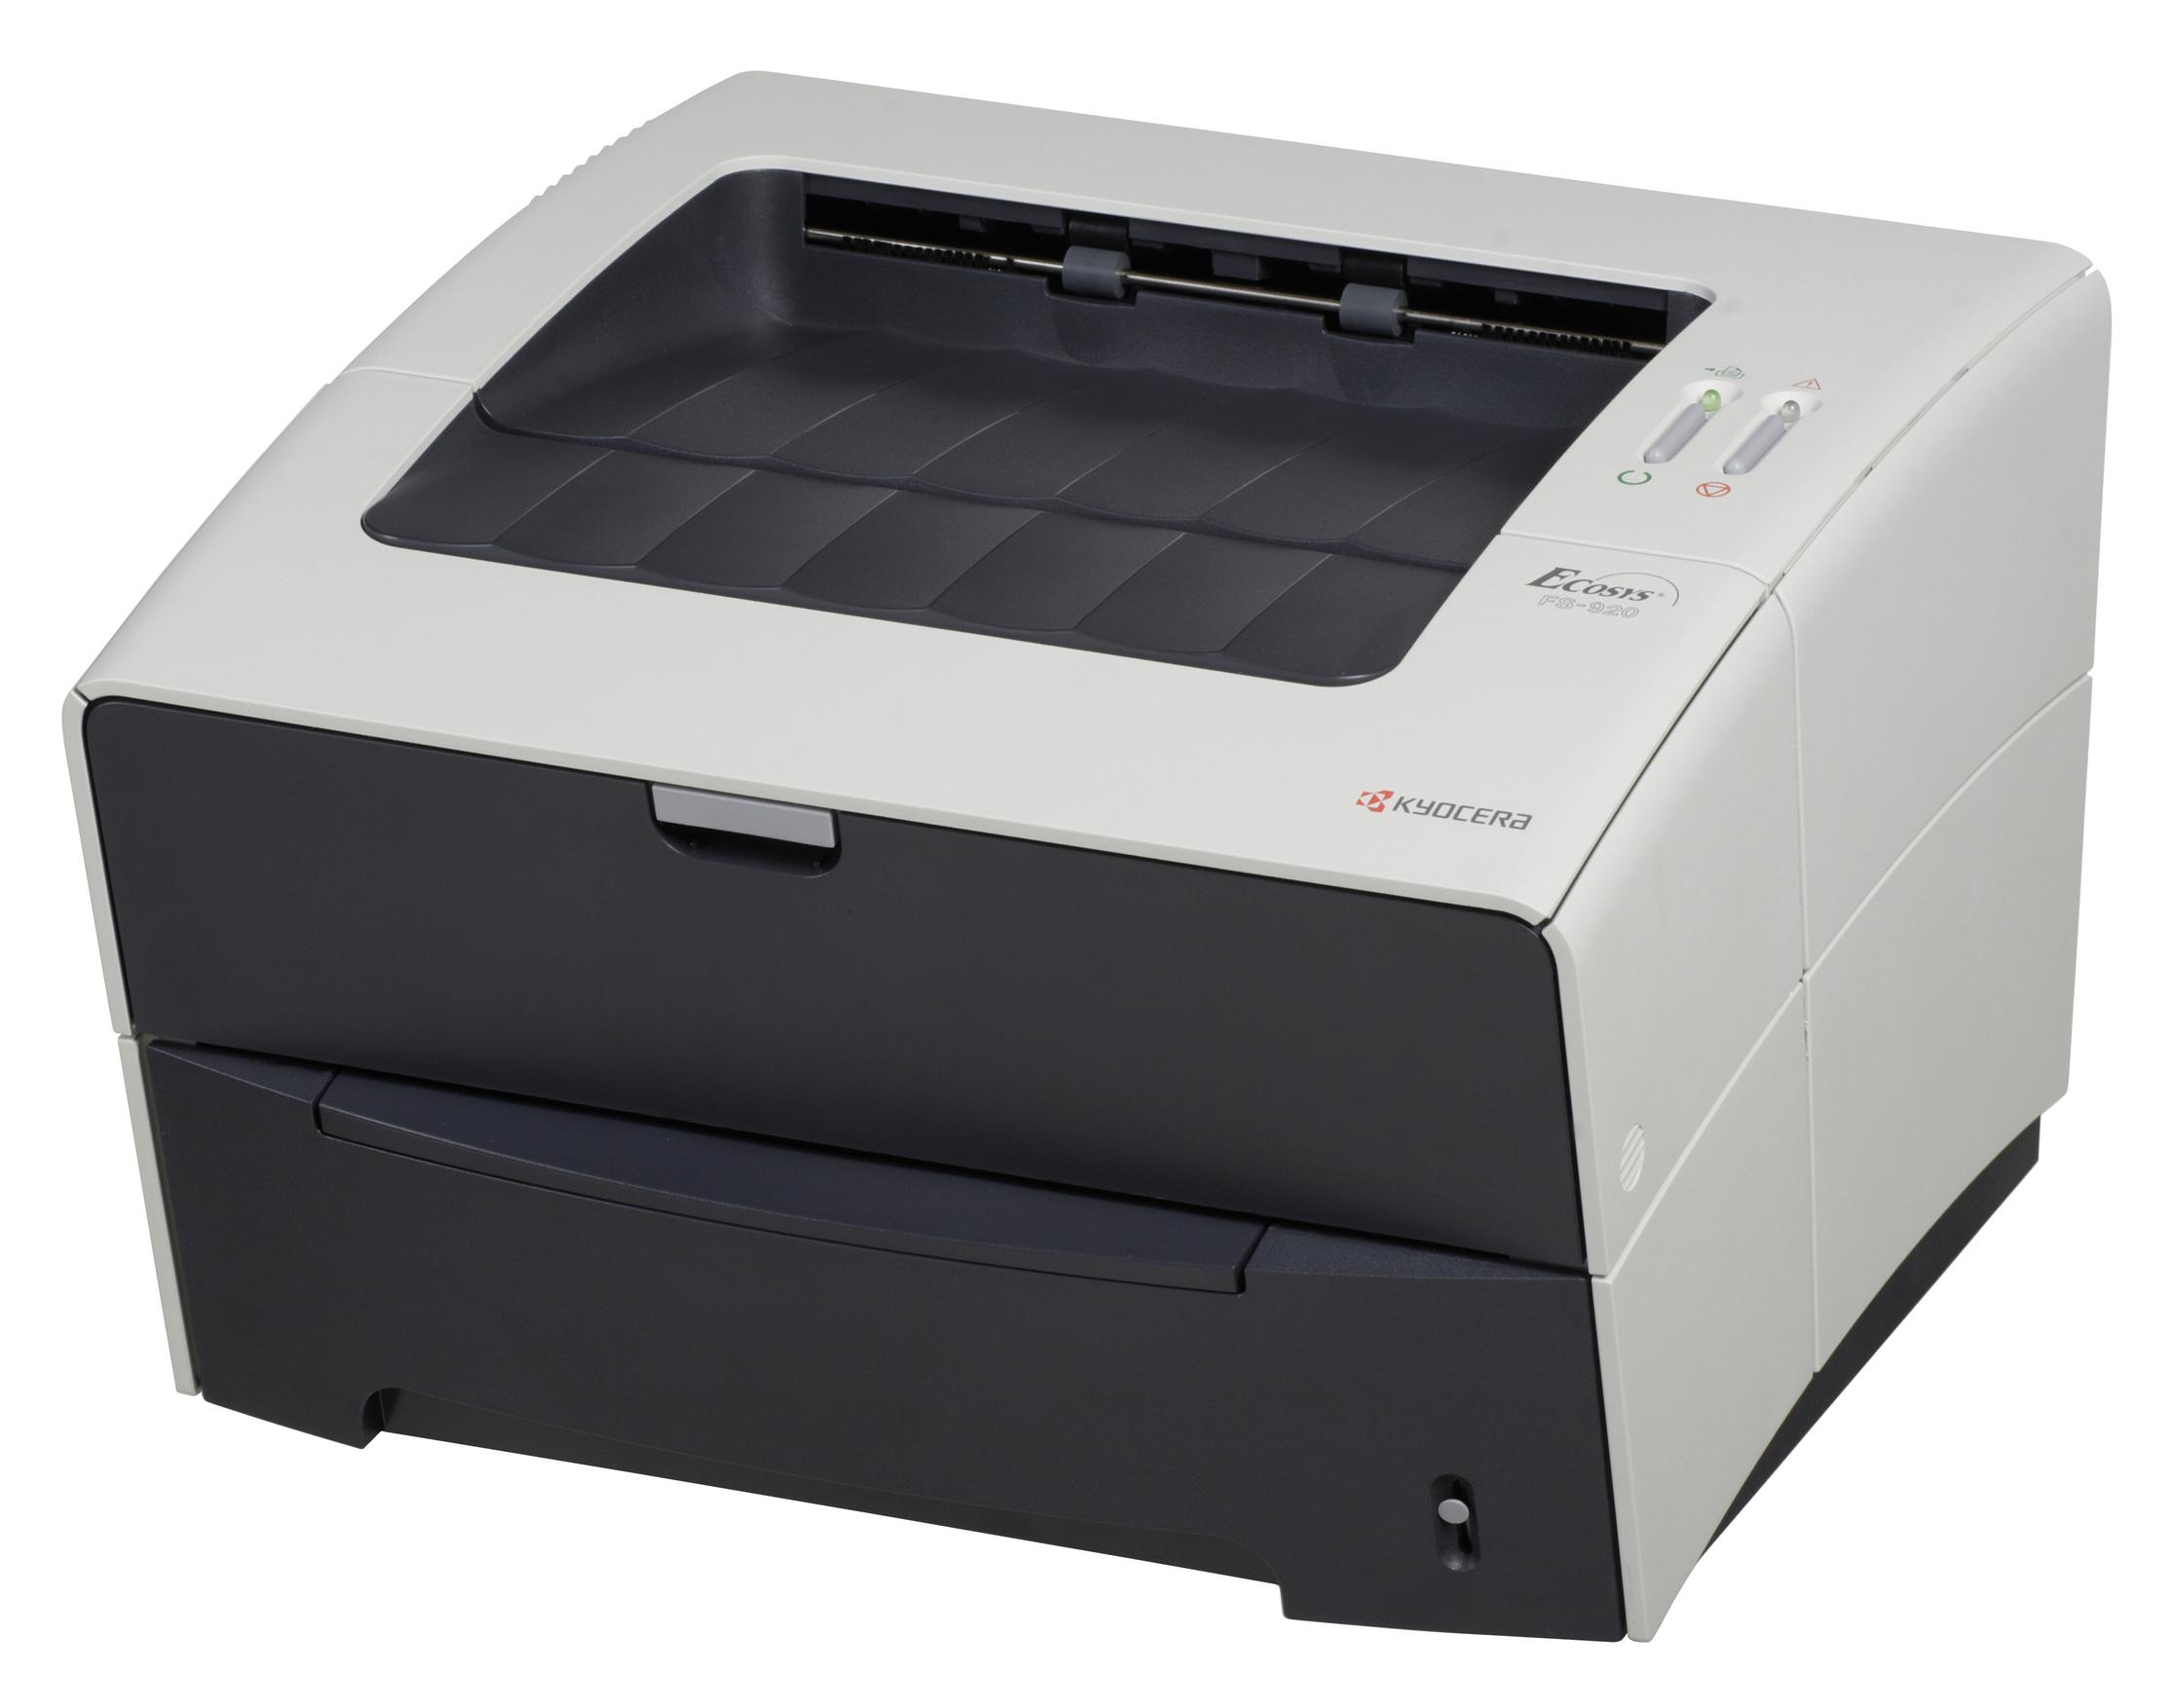 FS 920